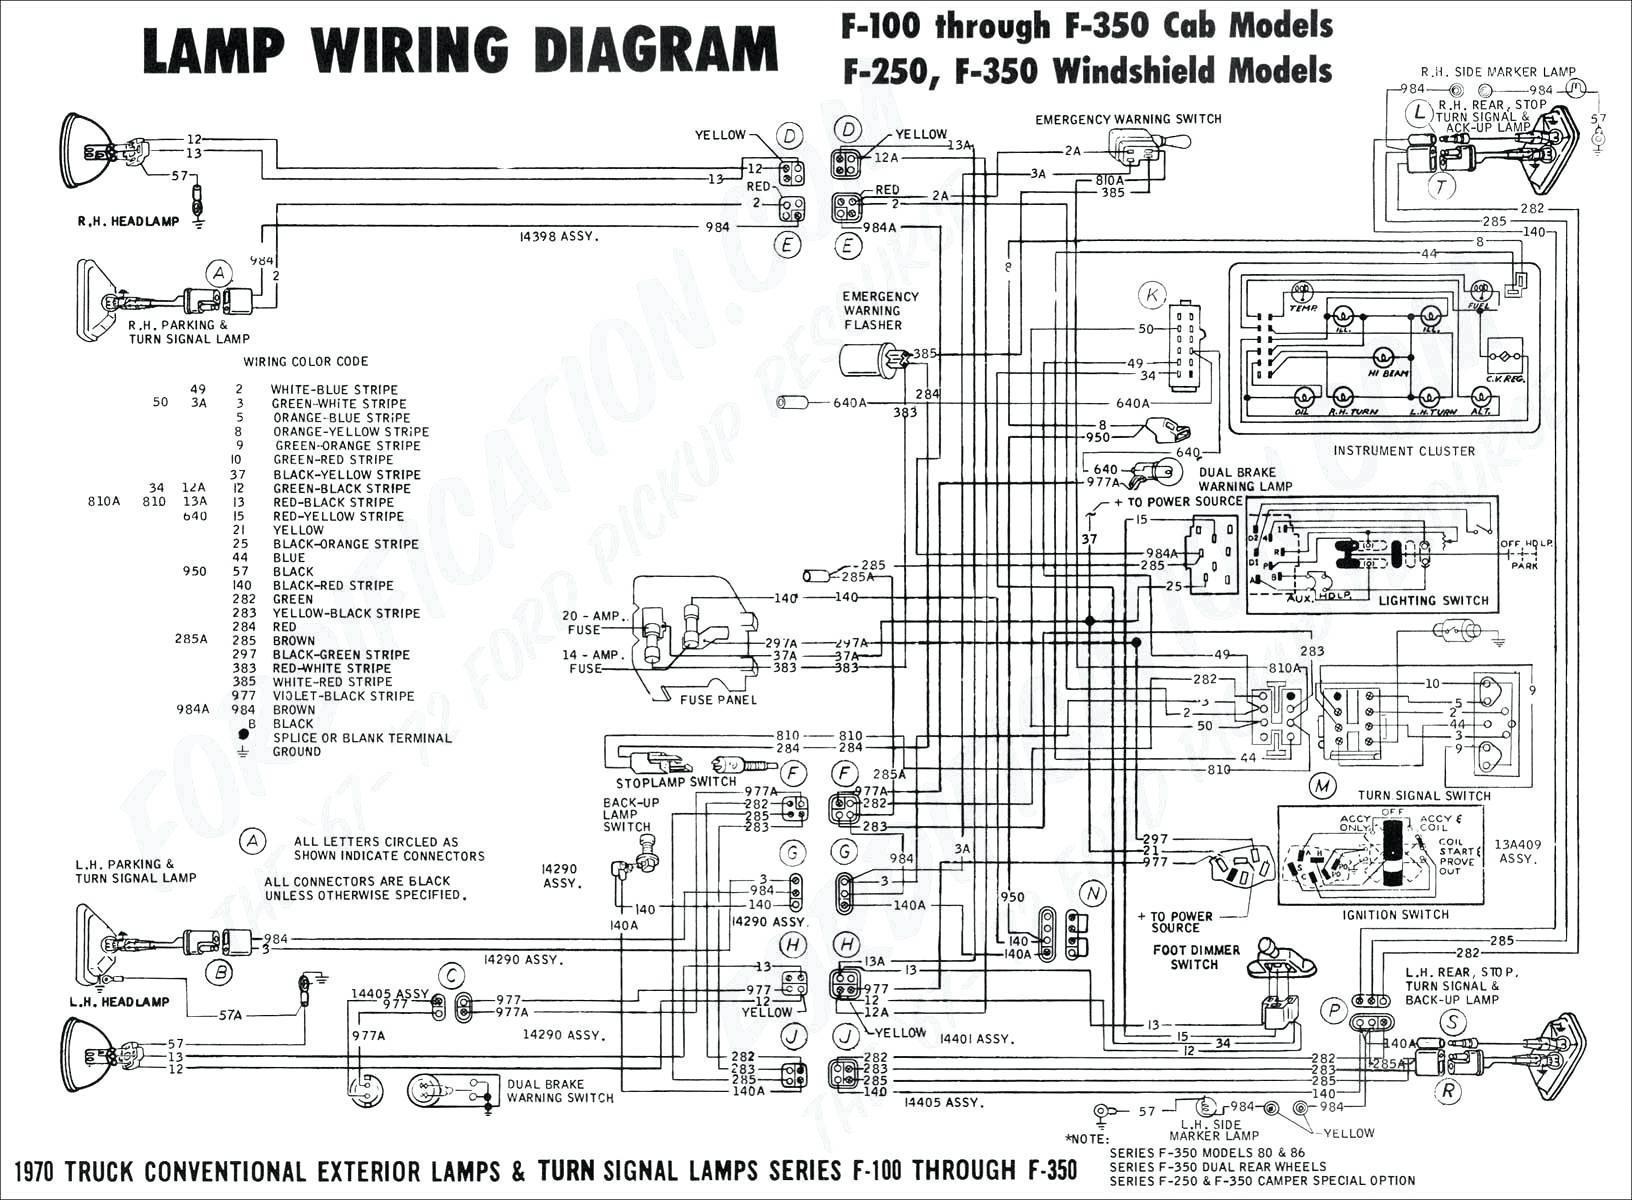 mitsubishi headlight wiring diagram gf 7949  mitsubishi ecu wiring diagram on 2004 mitsubishi fork  gf 7949  mitsubishi ecu wiring diagram